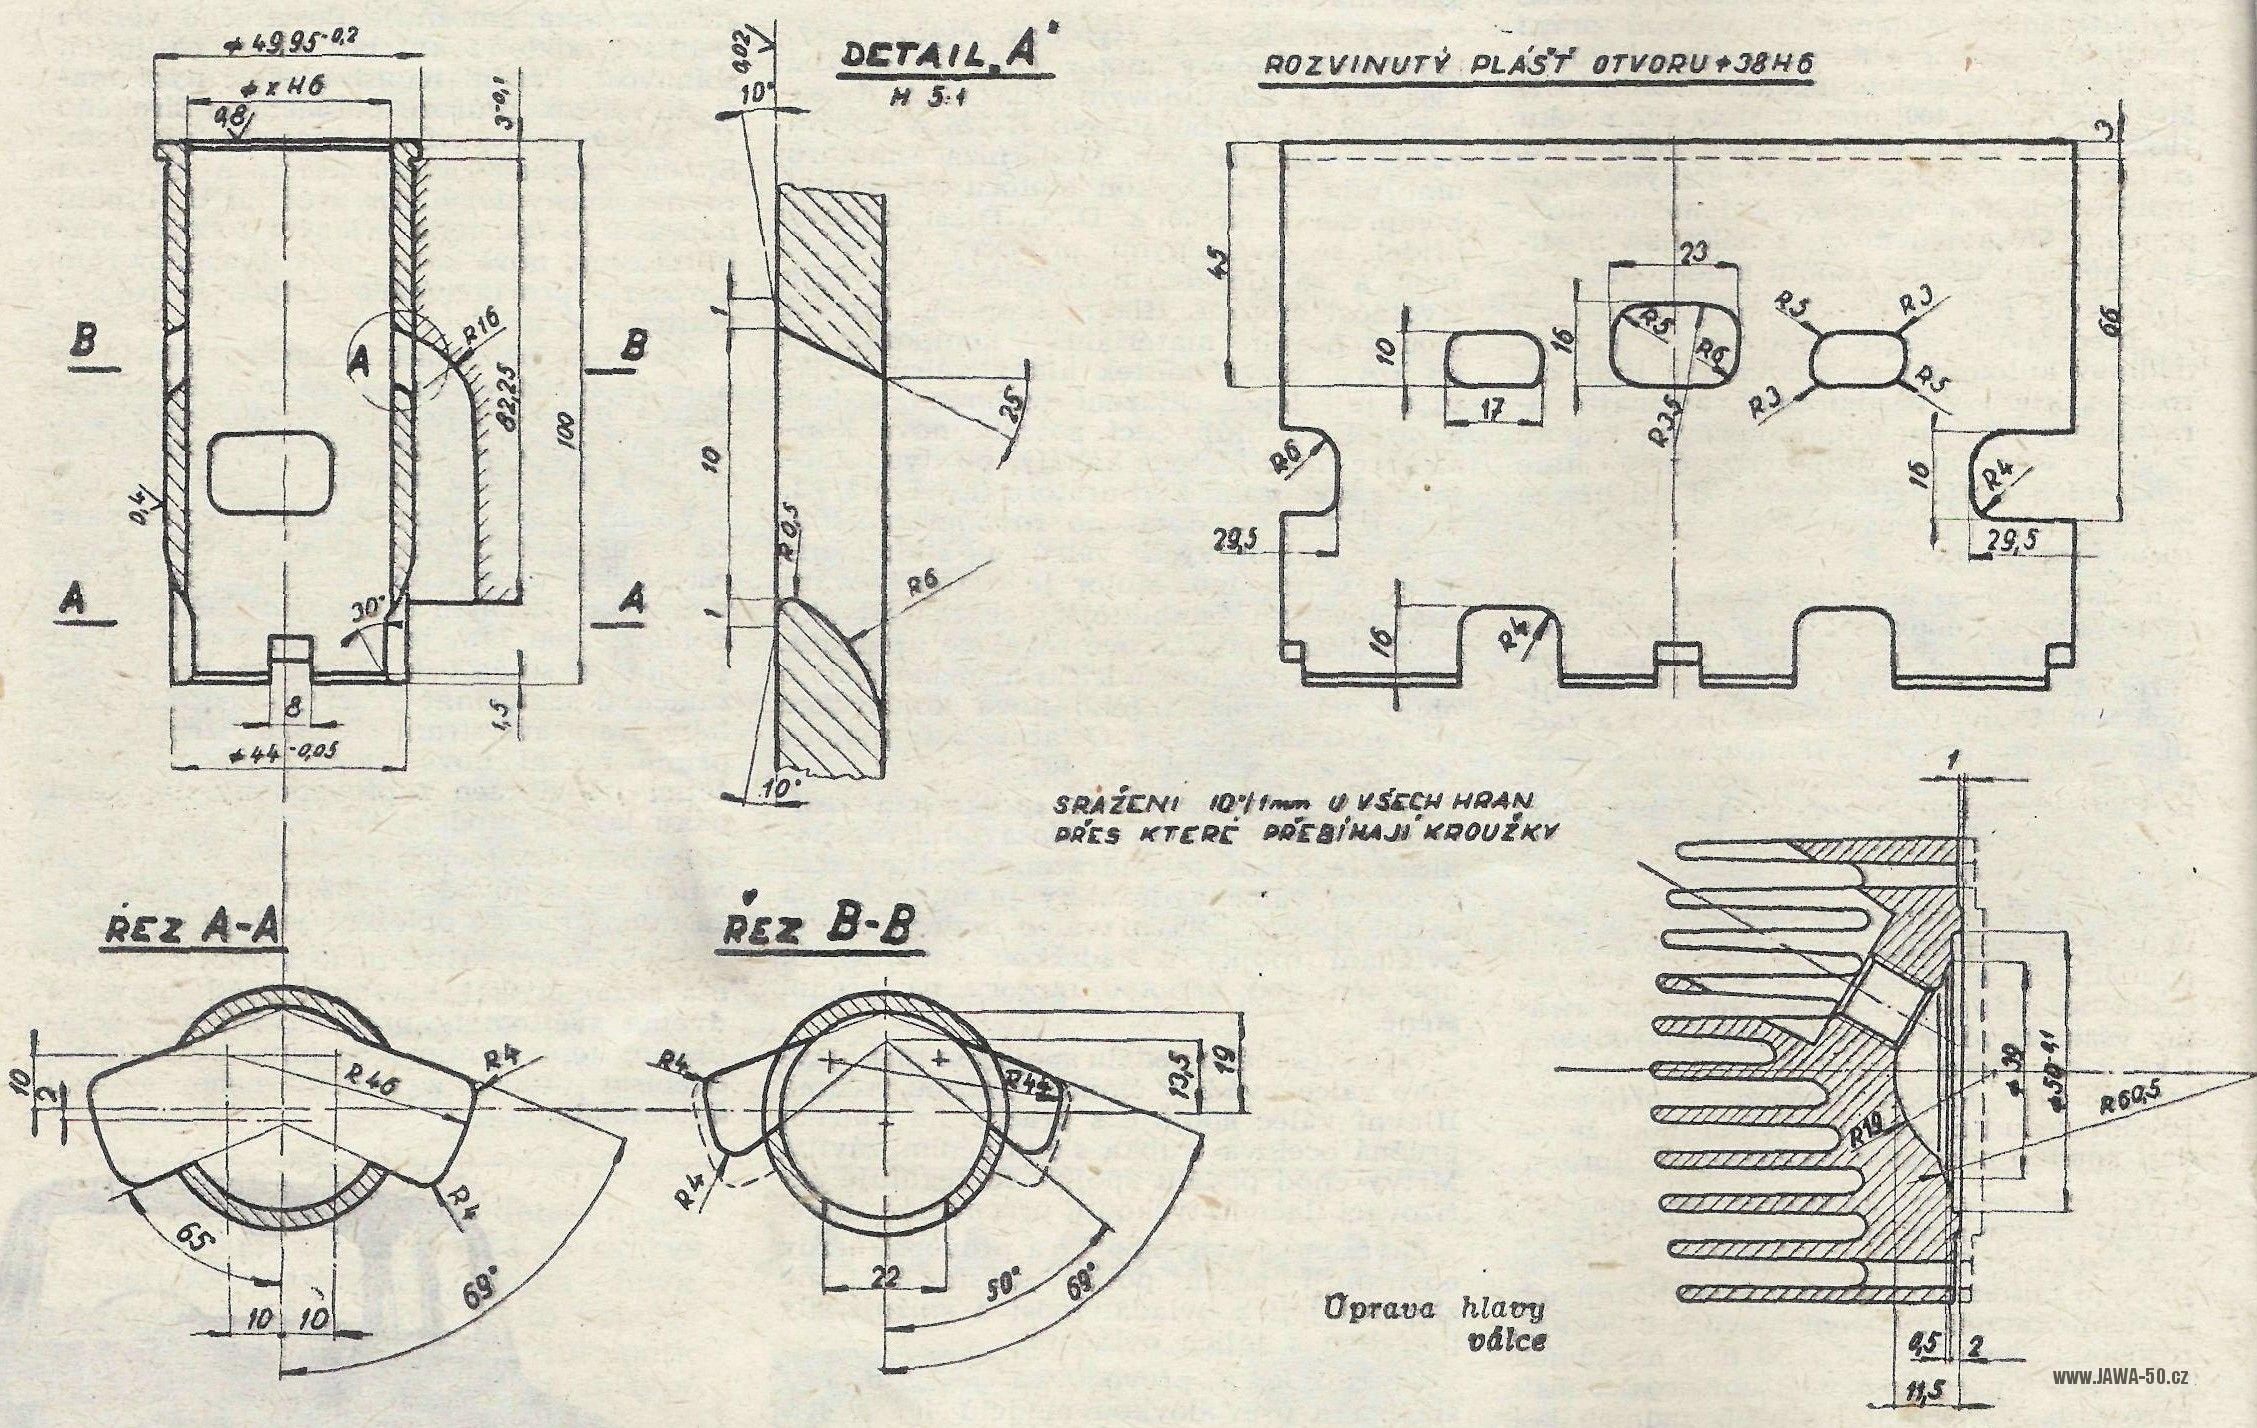 Uprava Motoru Jawa 05 Svet Motoru 24 1964 Jawa 50 Pionyr